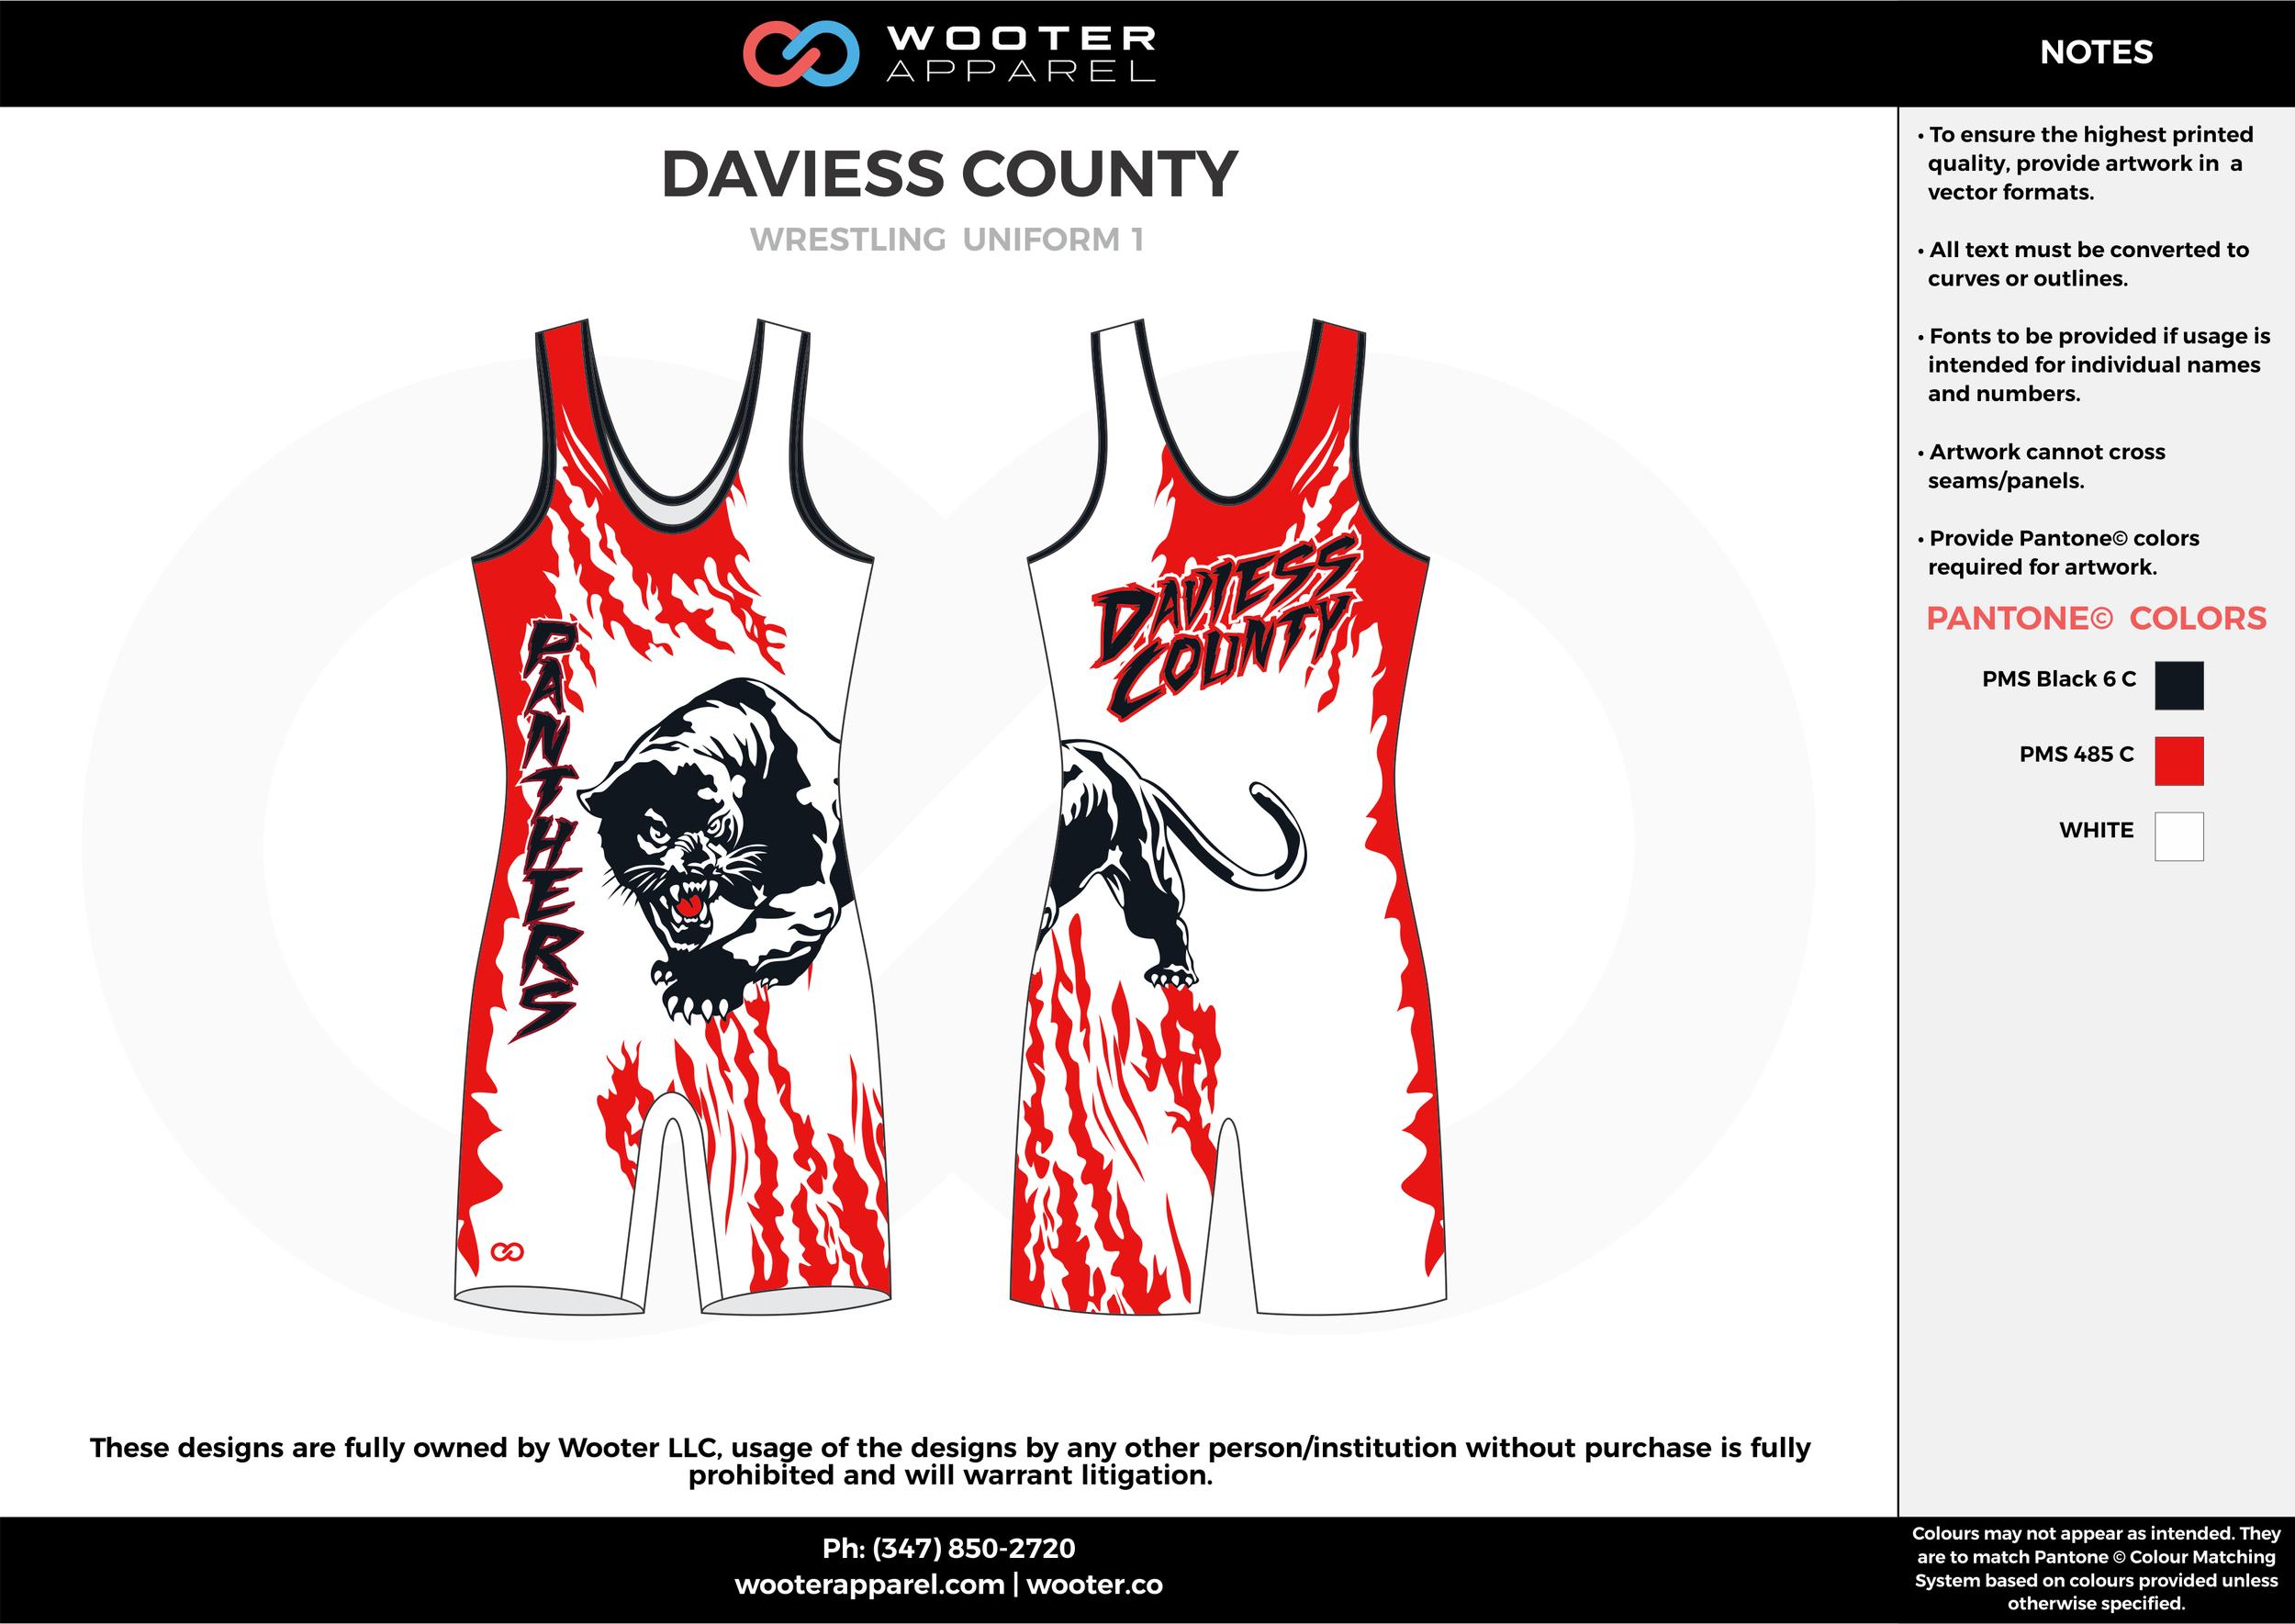 DAVIESS COUNTY Red White Black Wrestling Uniform 1